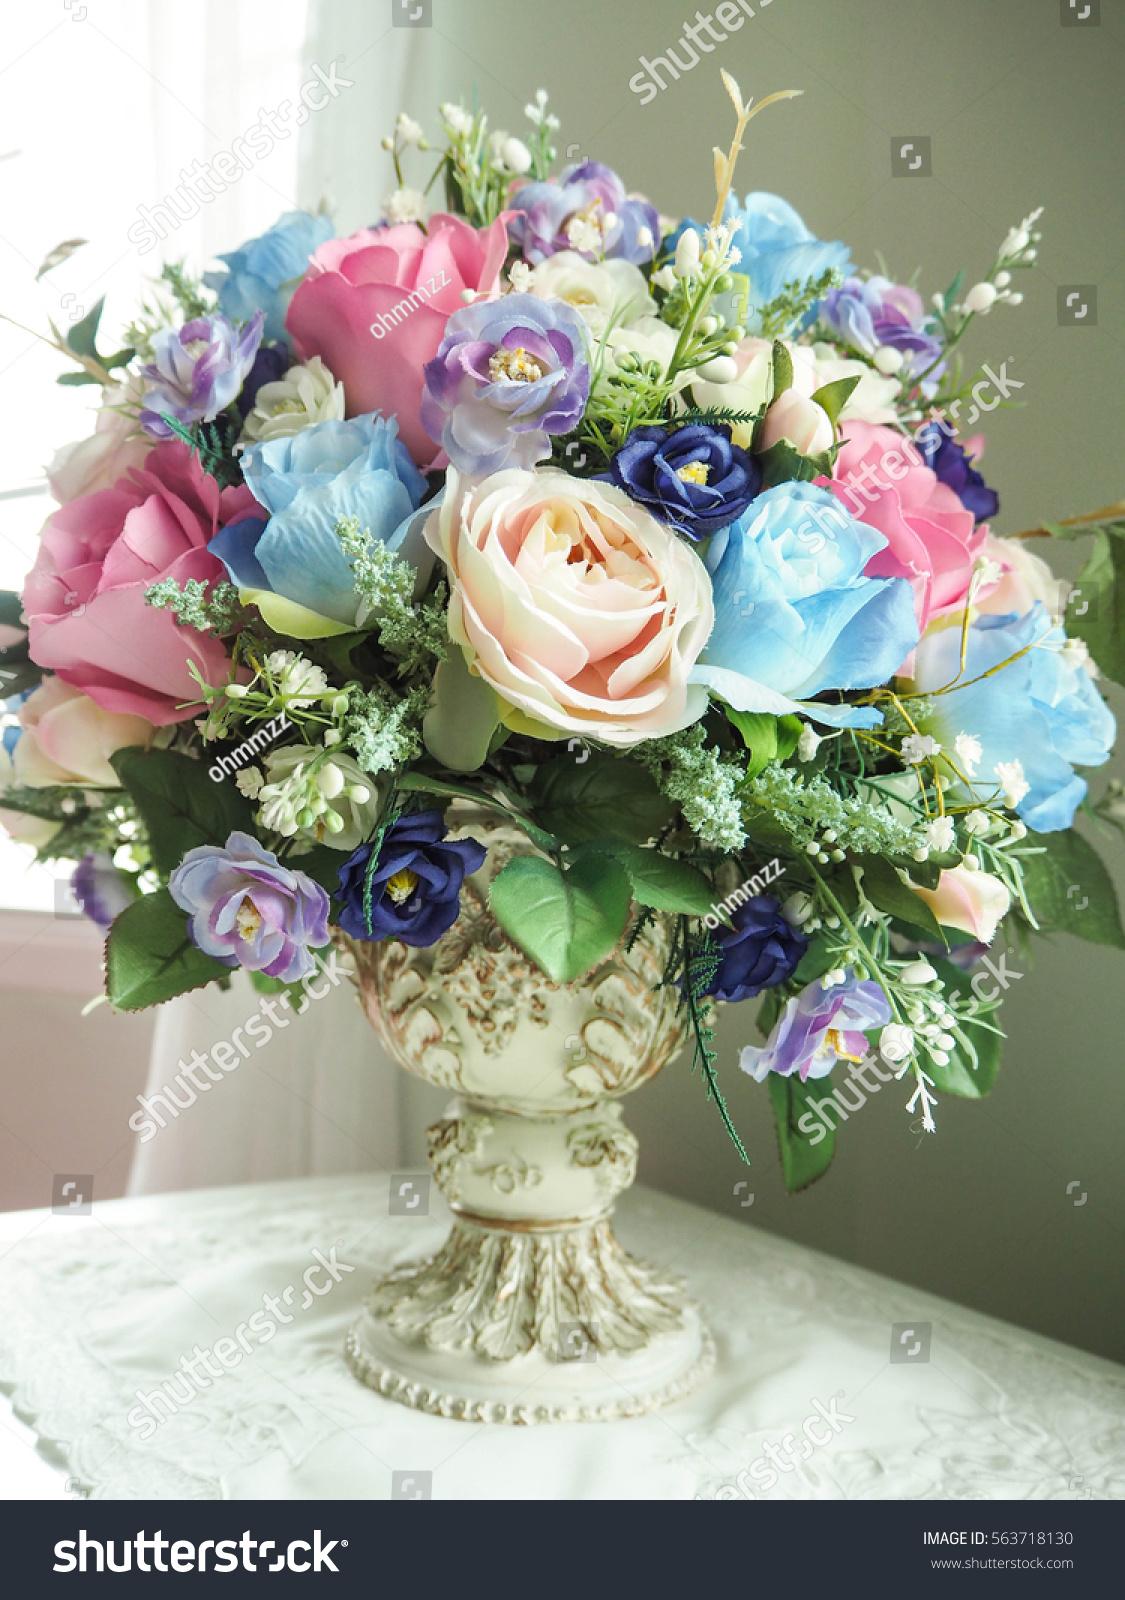 Fake flowers vase on table stock photo 563718130 shutterstock fake flowers in a vase on the table reviewsmspy